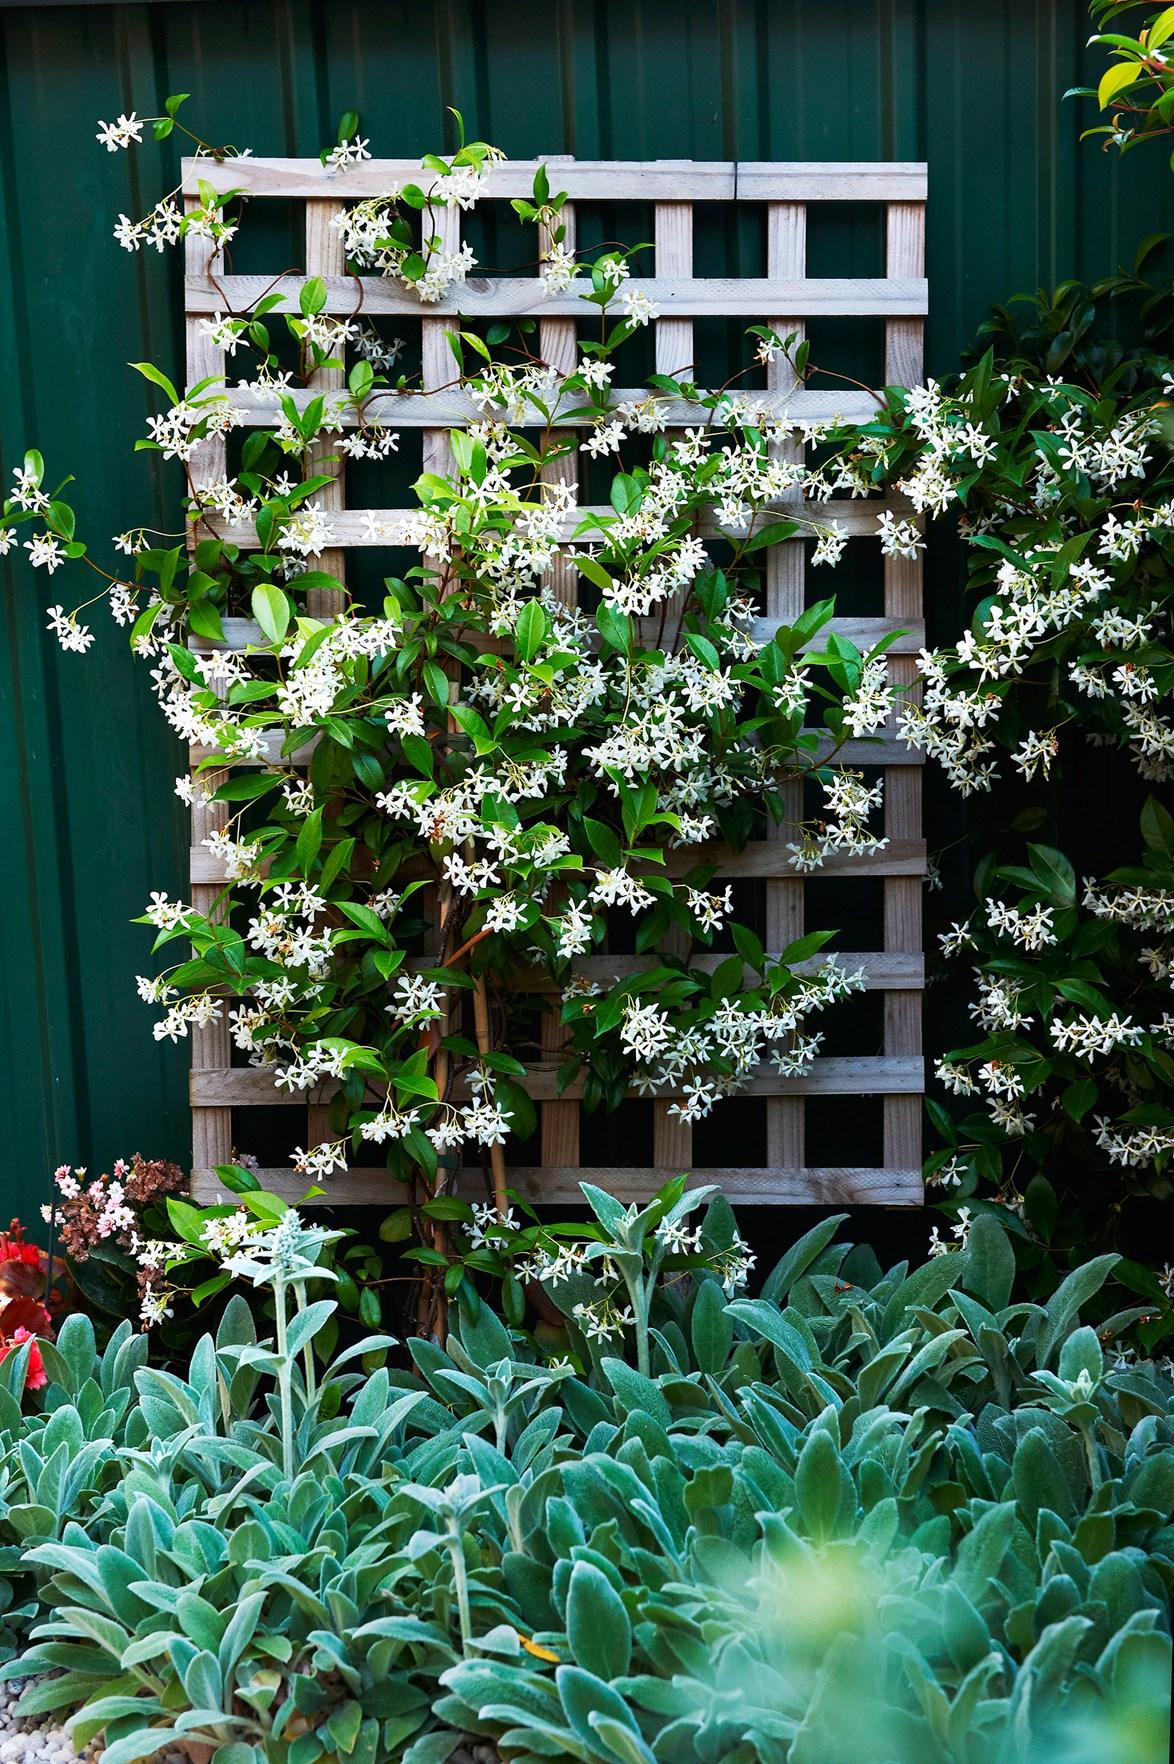 Star jasmine is the best choice for shady areas (Trachelospermum jasminoides).